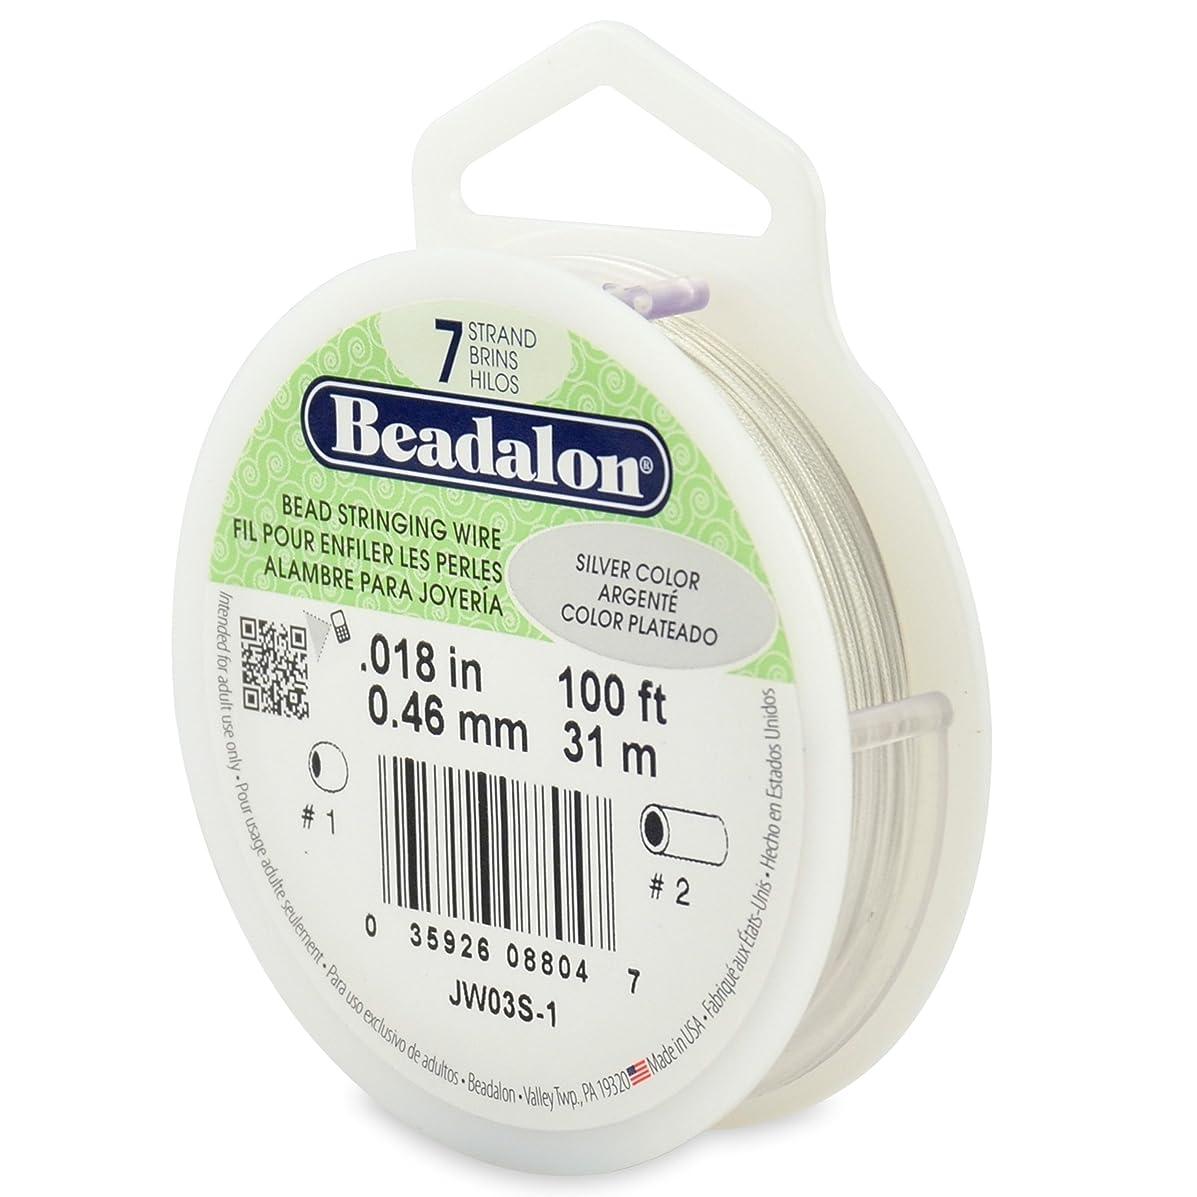 Beadalon 7-Strand Bead Stringing Wire, 0.018-Inch, Silver Color, 100-Feet